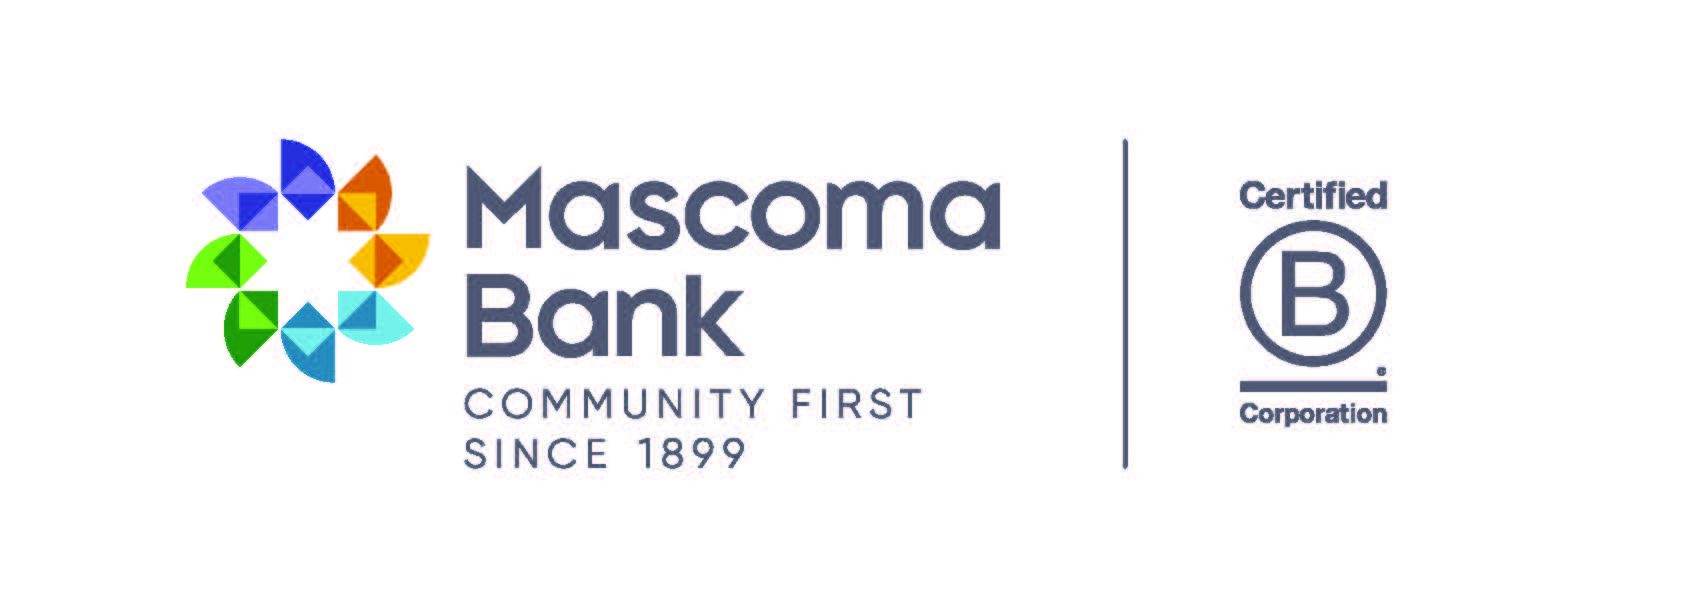 Mascoma Bank cert B